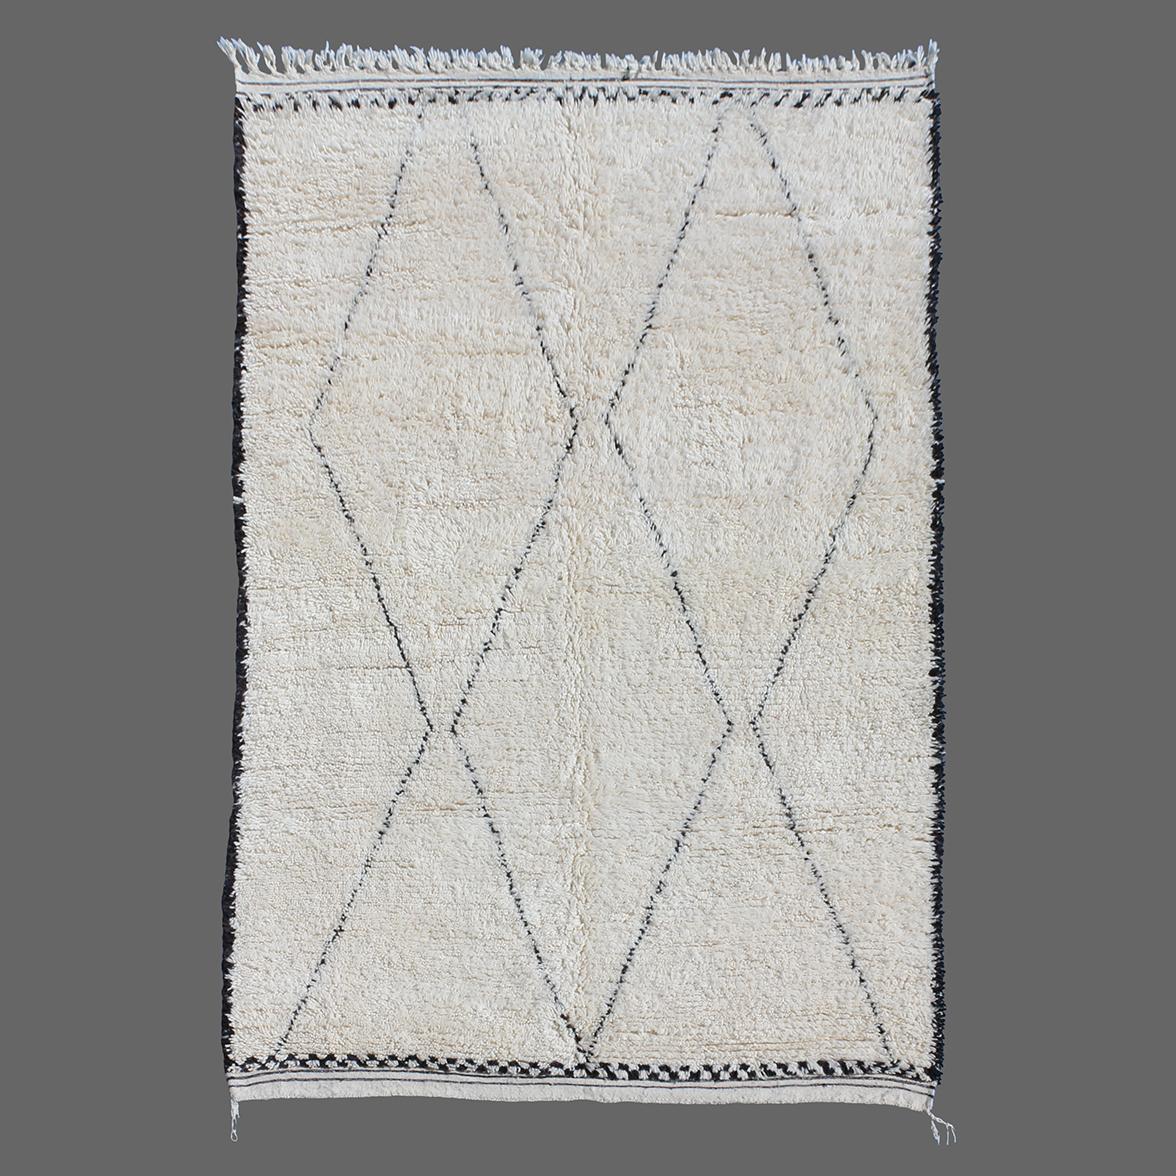 tapis de beni ouarain - Tapis Beni Ouarain